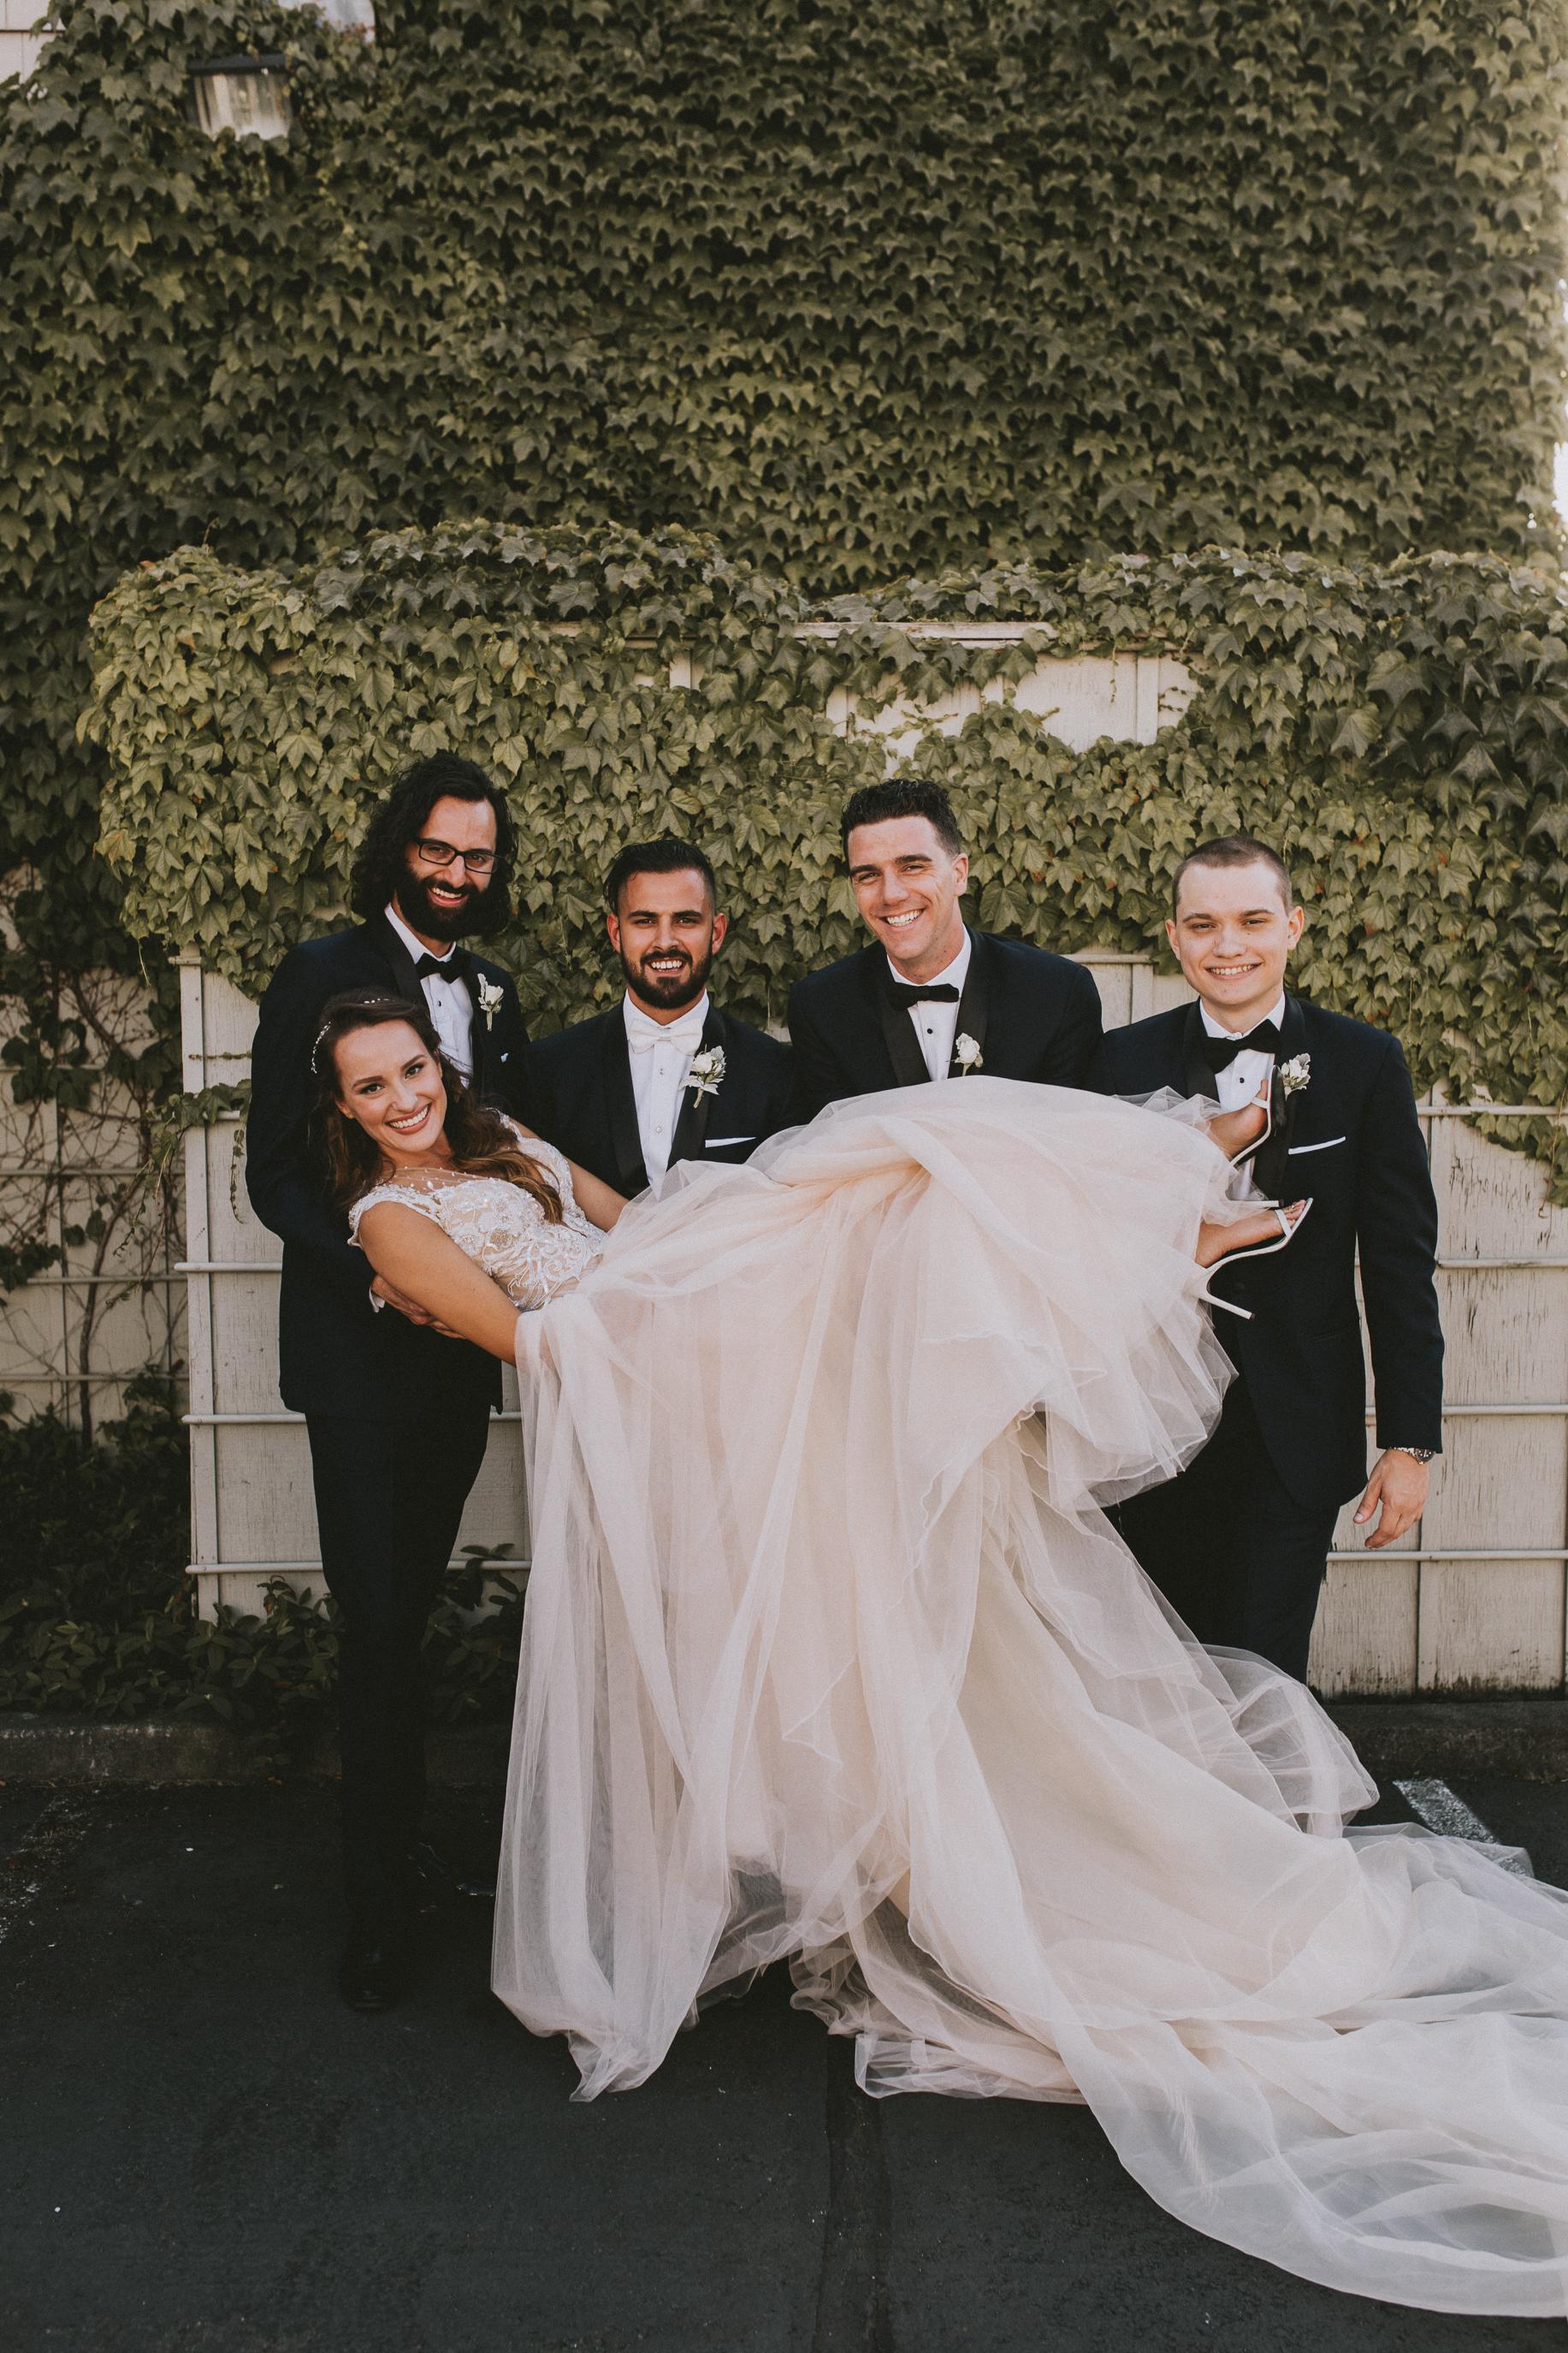 SAMLANDRETH-bridals-31.jpg